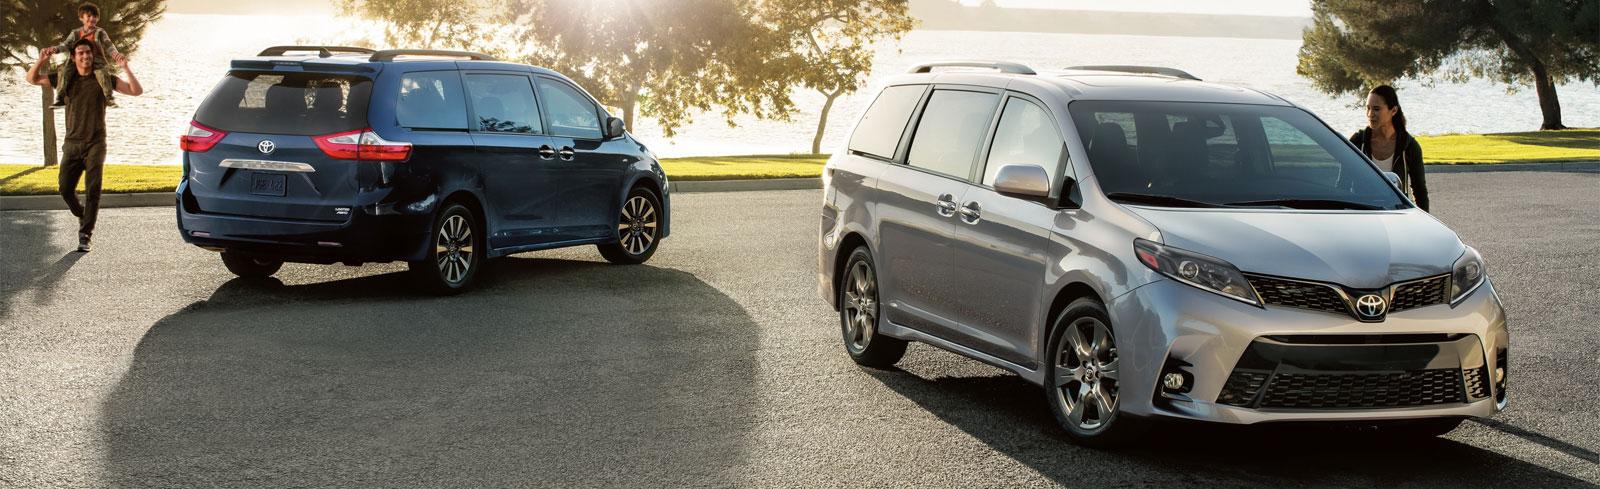 See the 2020 Toyota Sienna Minivan in Oklahoma City, Oklahoma